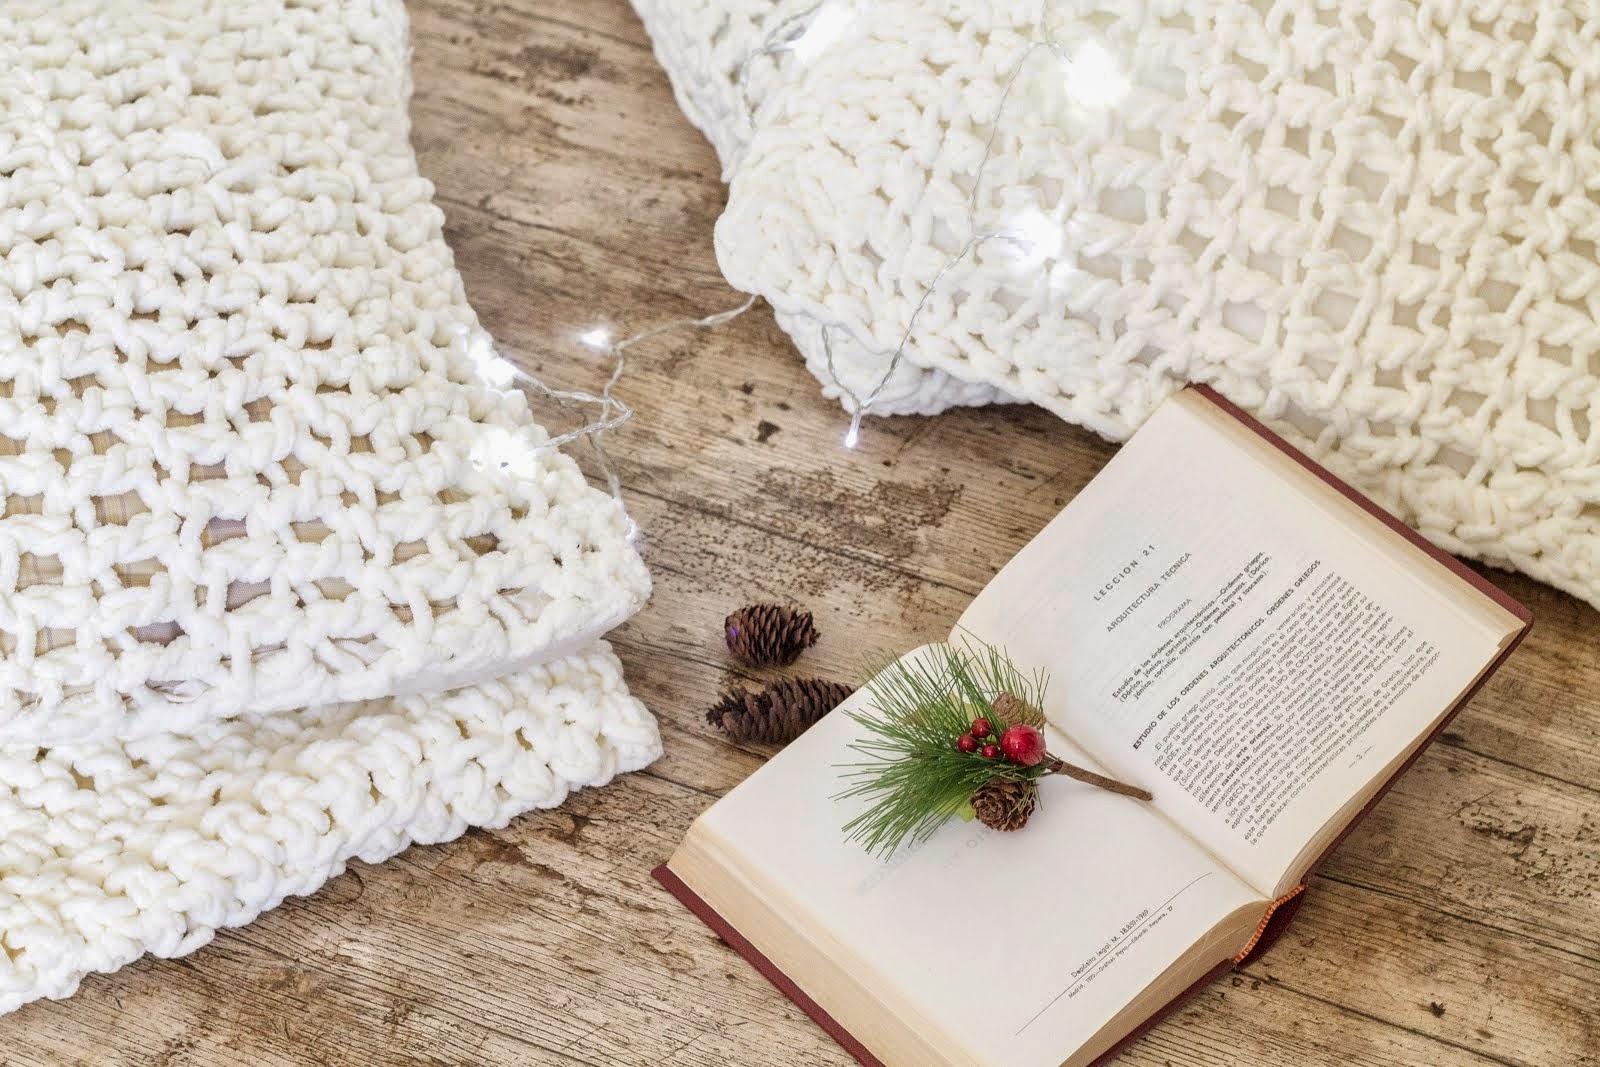 DIY Crocheteando cojines mullidos de lana gruesa / Handmade Crochet Cushion Cover